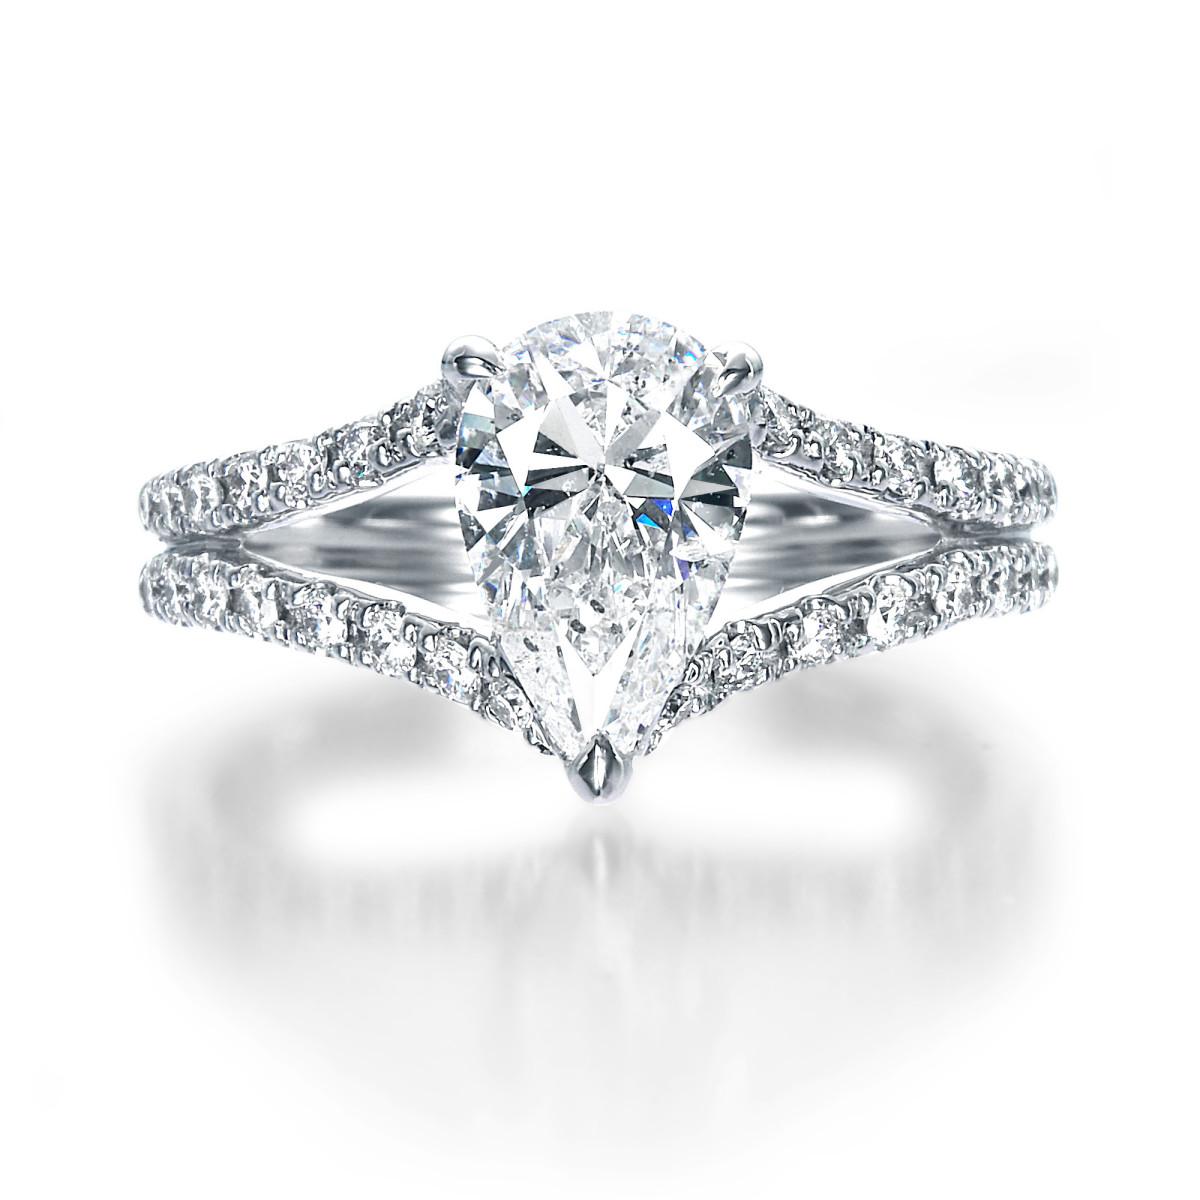 1 Carat Pear Shape Diamond Ring